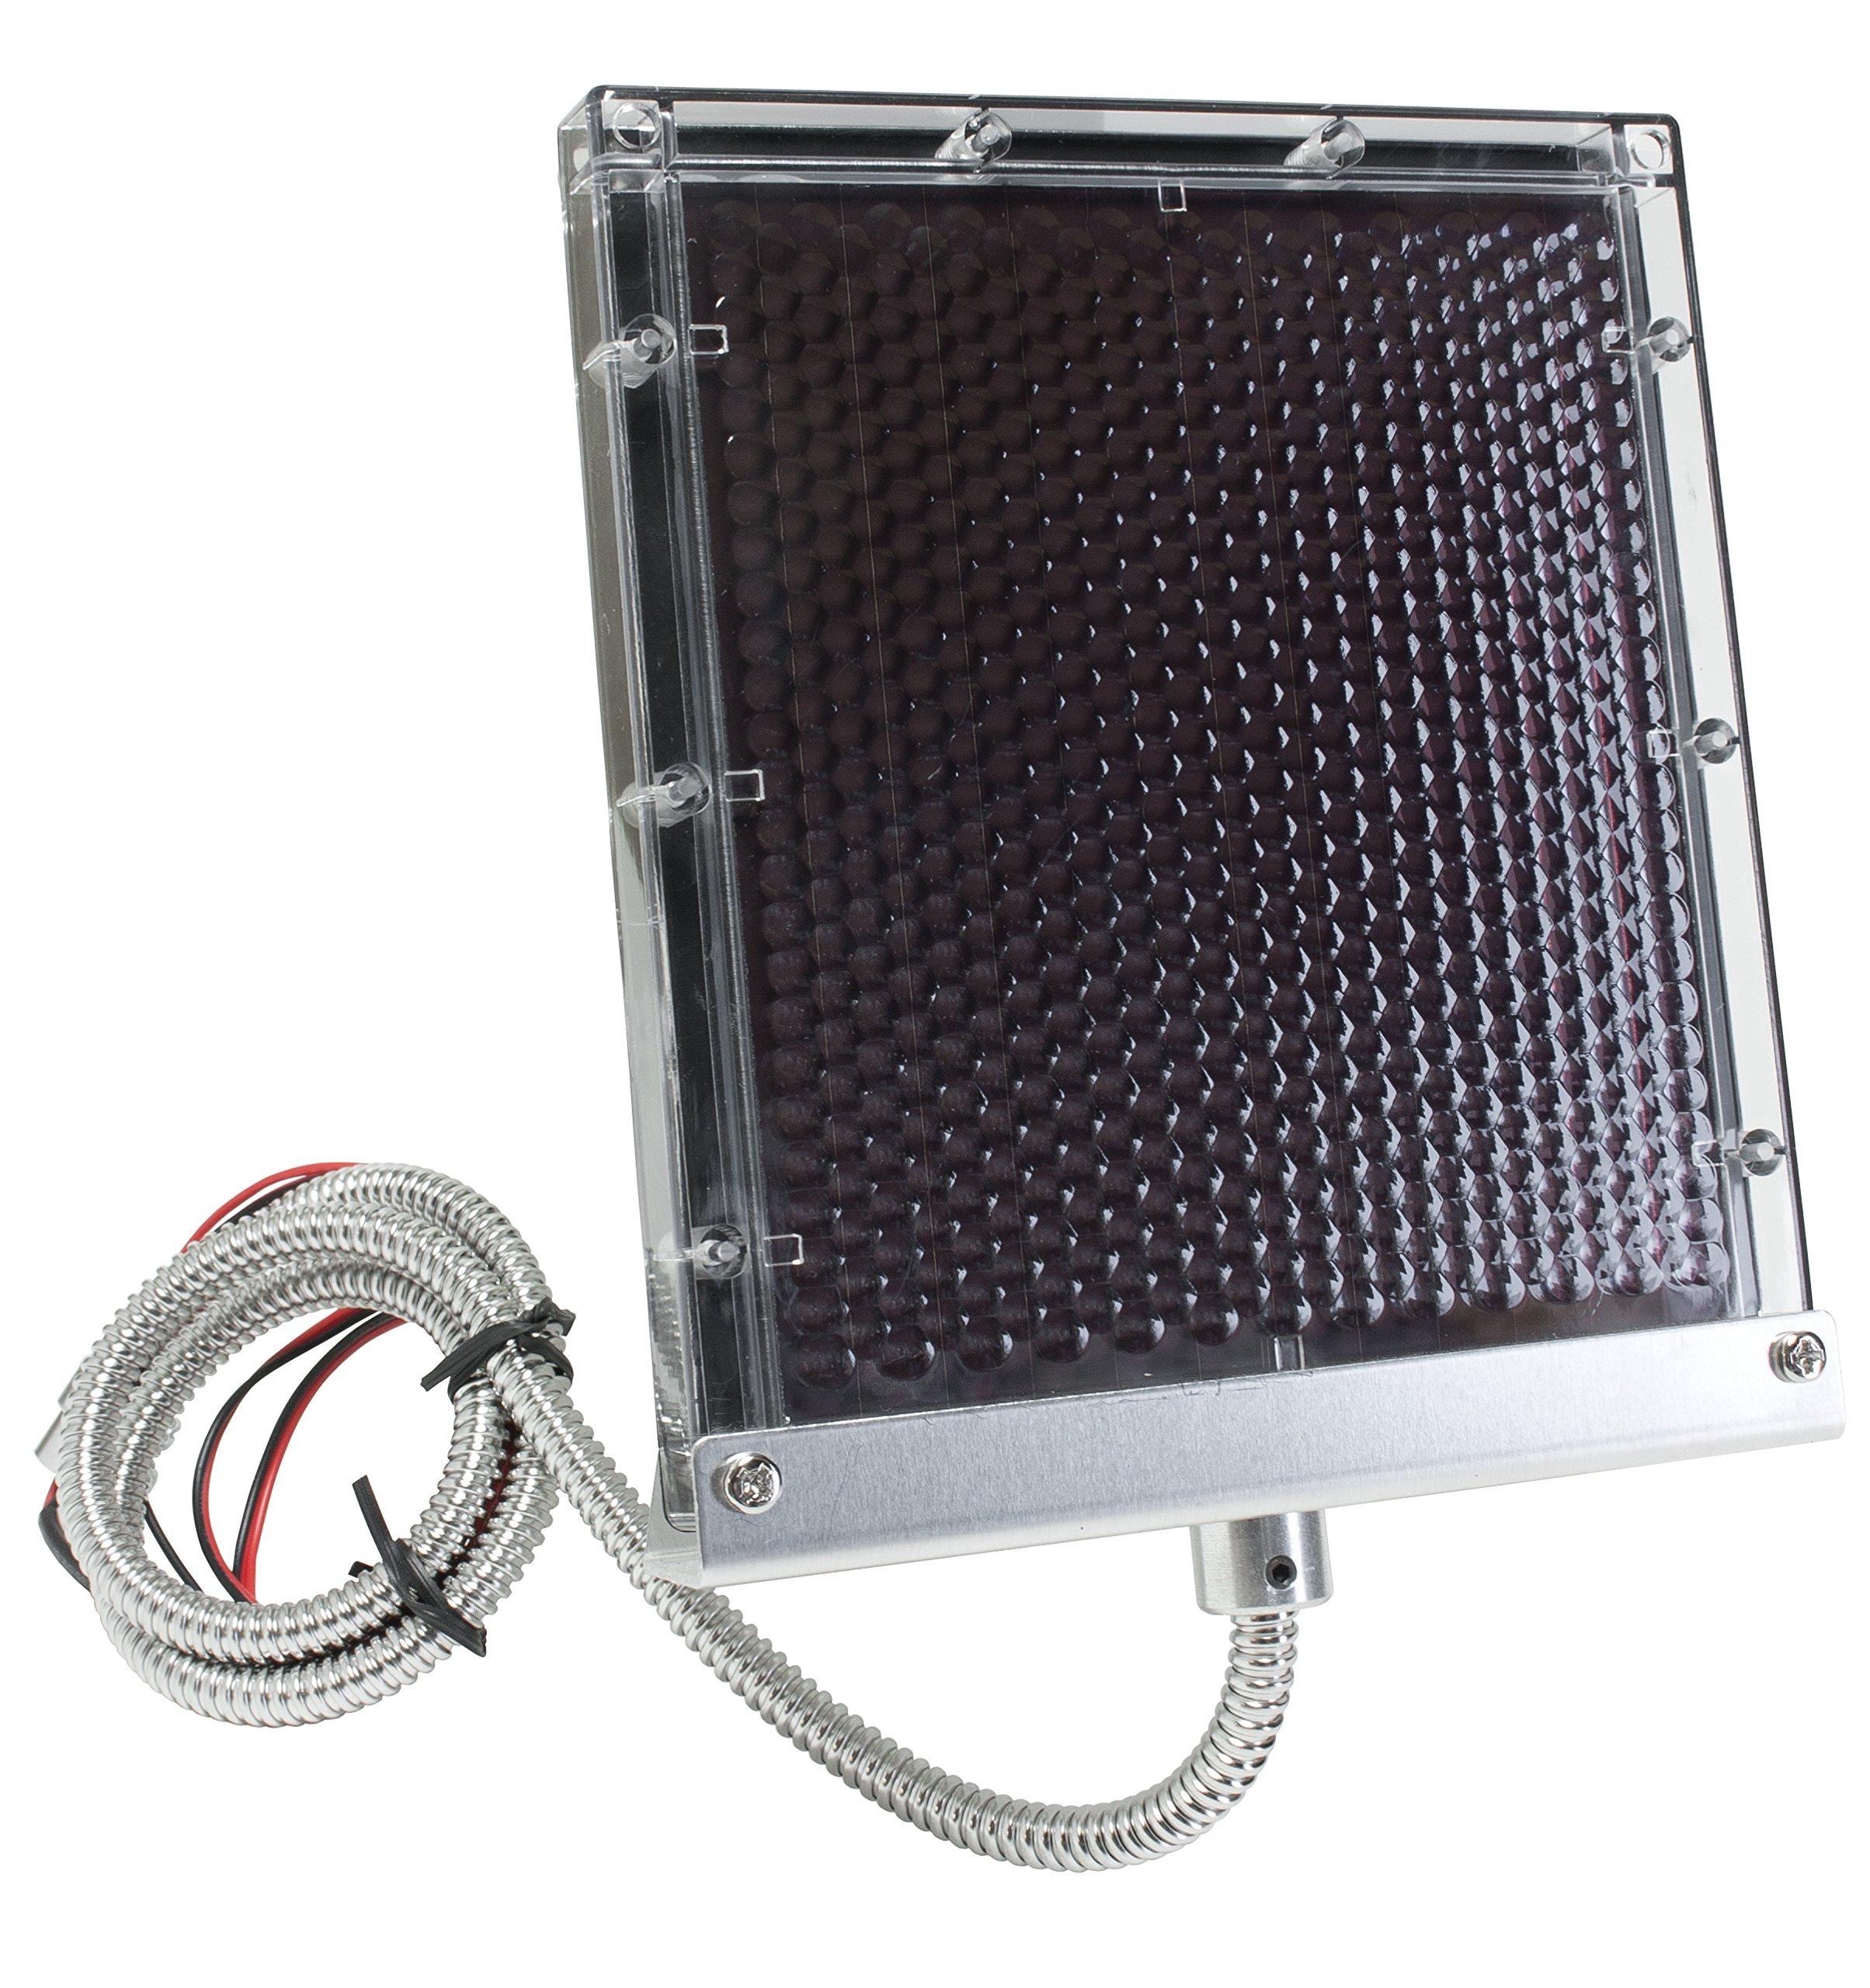 Wildgame Innovations 12 Volt eDRENALINE Solar Panel